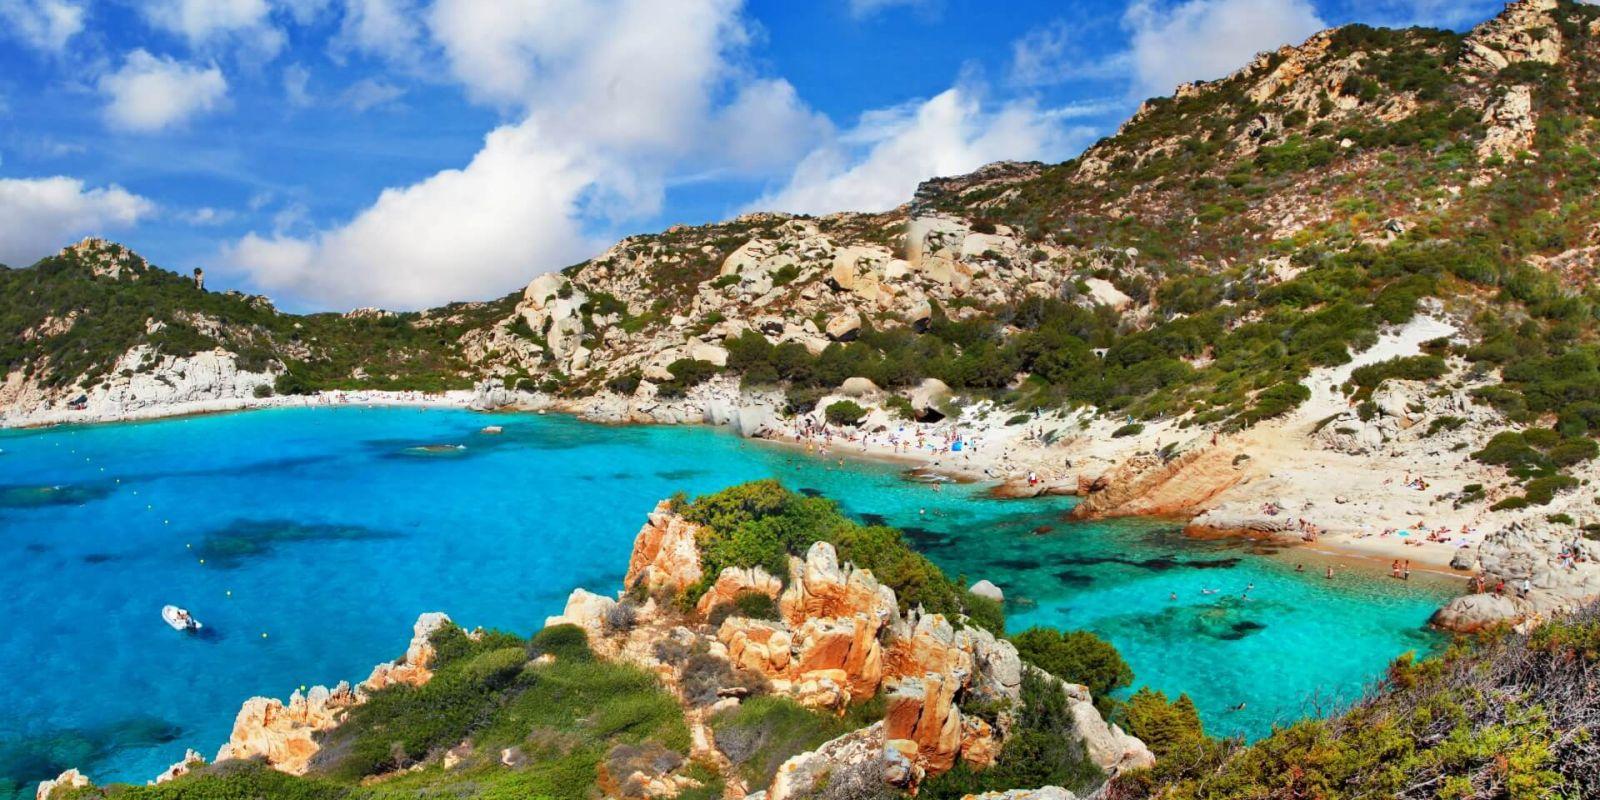 https://www.talamare.fr/medias/Location yacht Corse, louer un yacht en Sardaigne